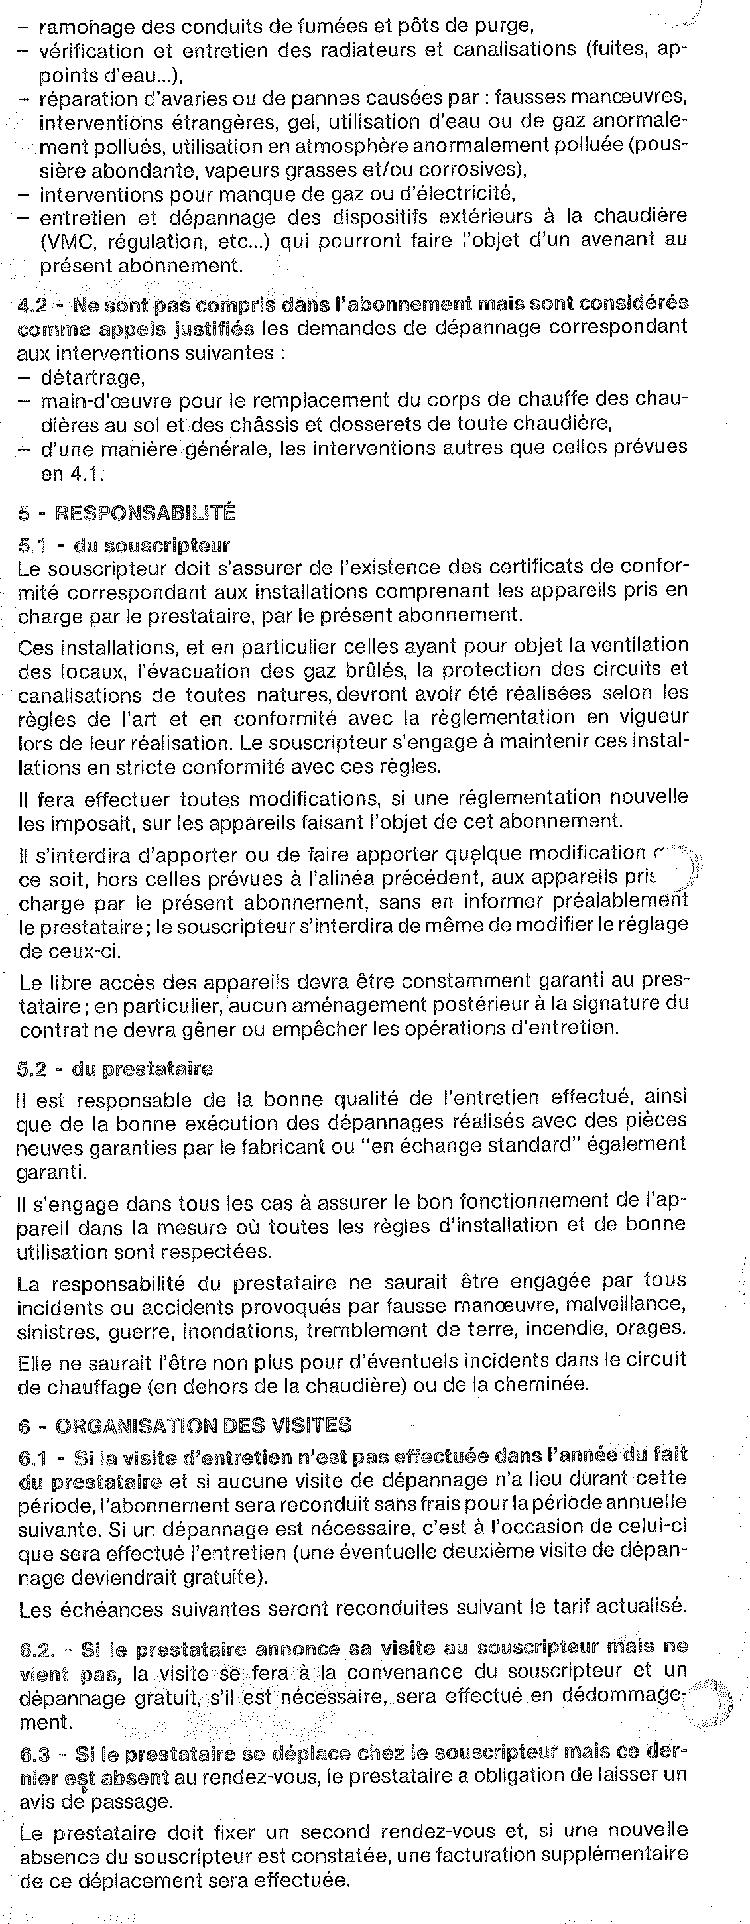 conditions generales 3